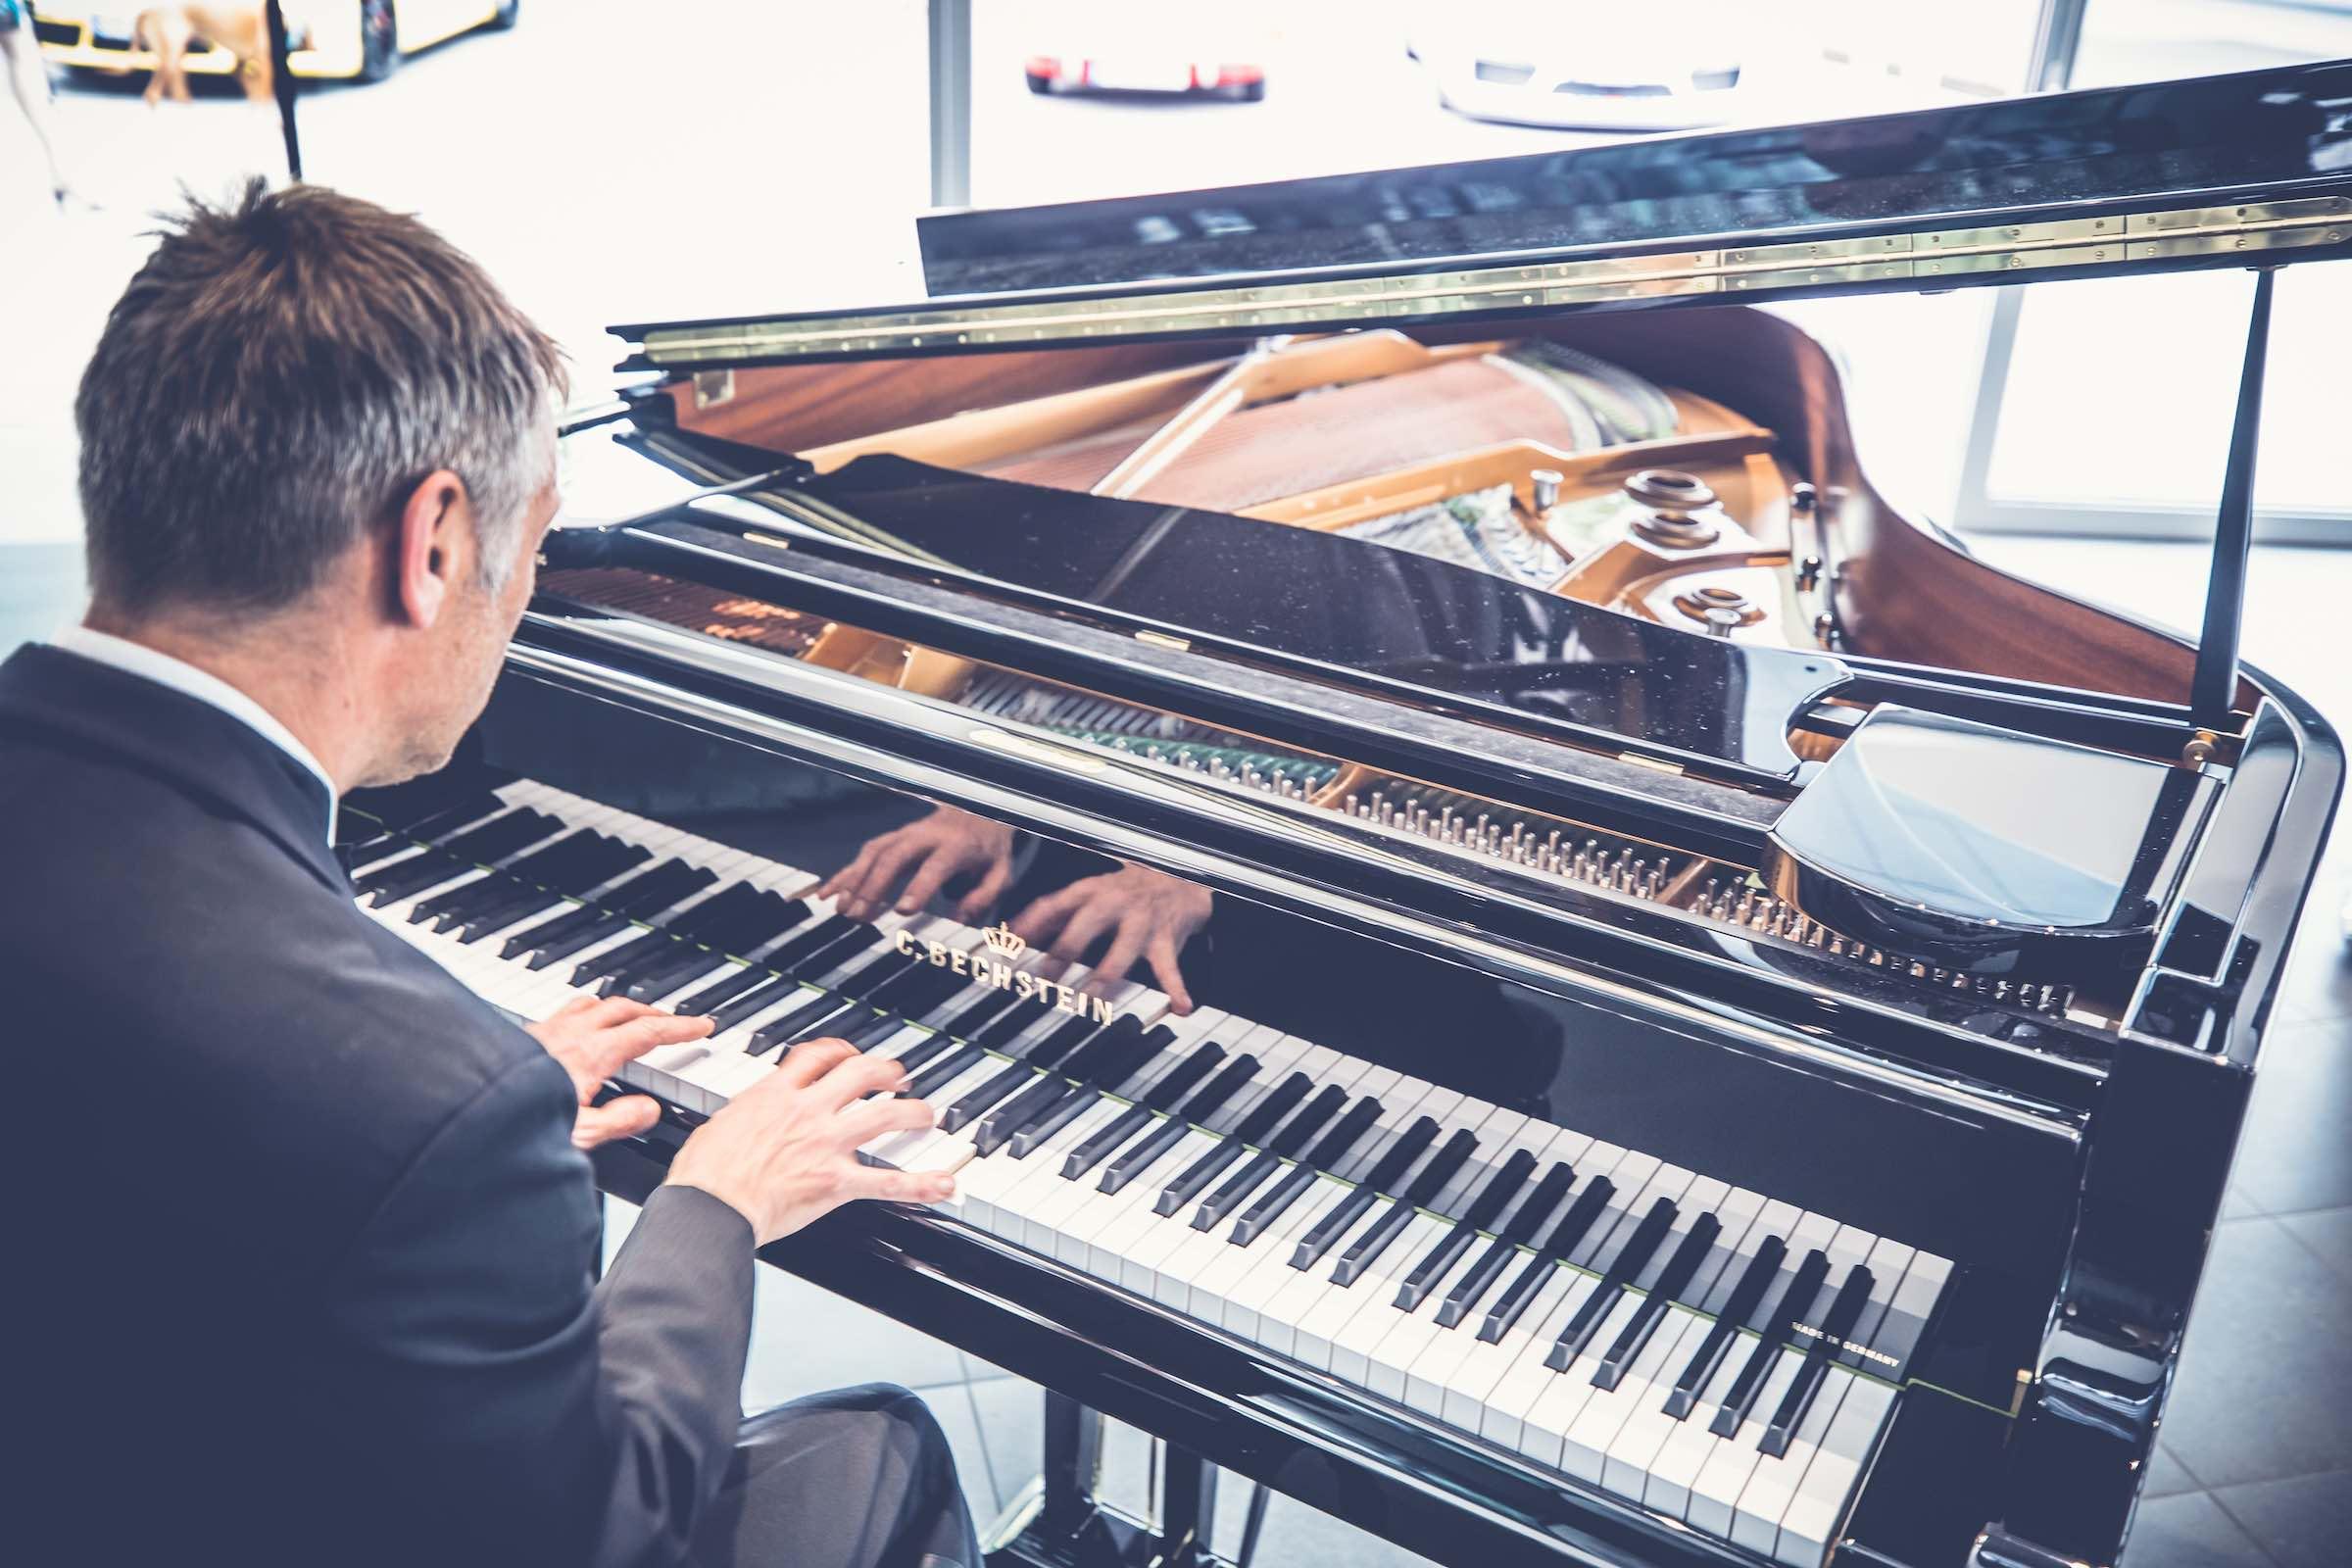 Band | Hannover | Liveband | Partyband | Jazzband | Swingband | Lounge | Pop | Jazz | Klavierspieler | Pianist | Piano | Hochzeit | Trauung | Messe | Firmenfeier | Charity | Gala | Buchen | Mieten | Anfragen |Modern-Jukes